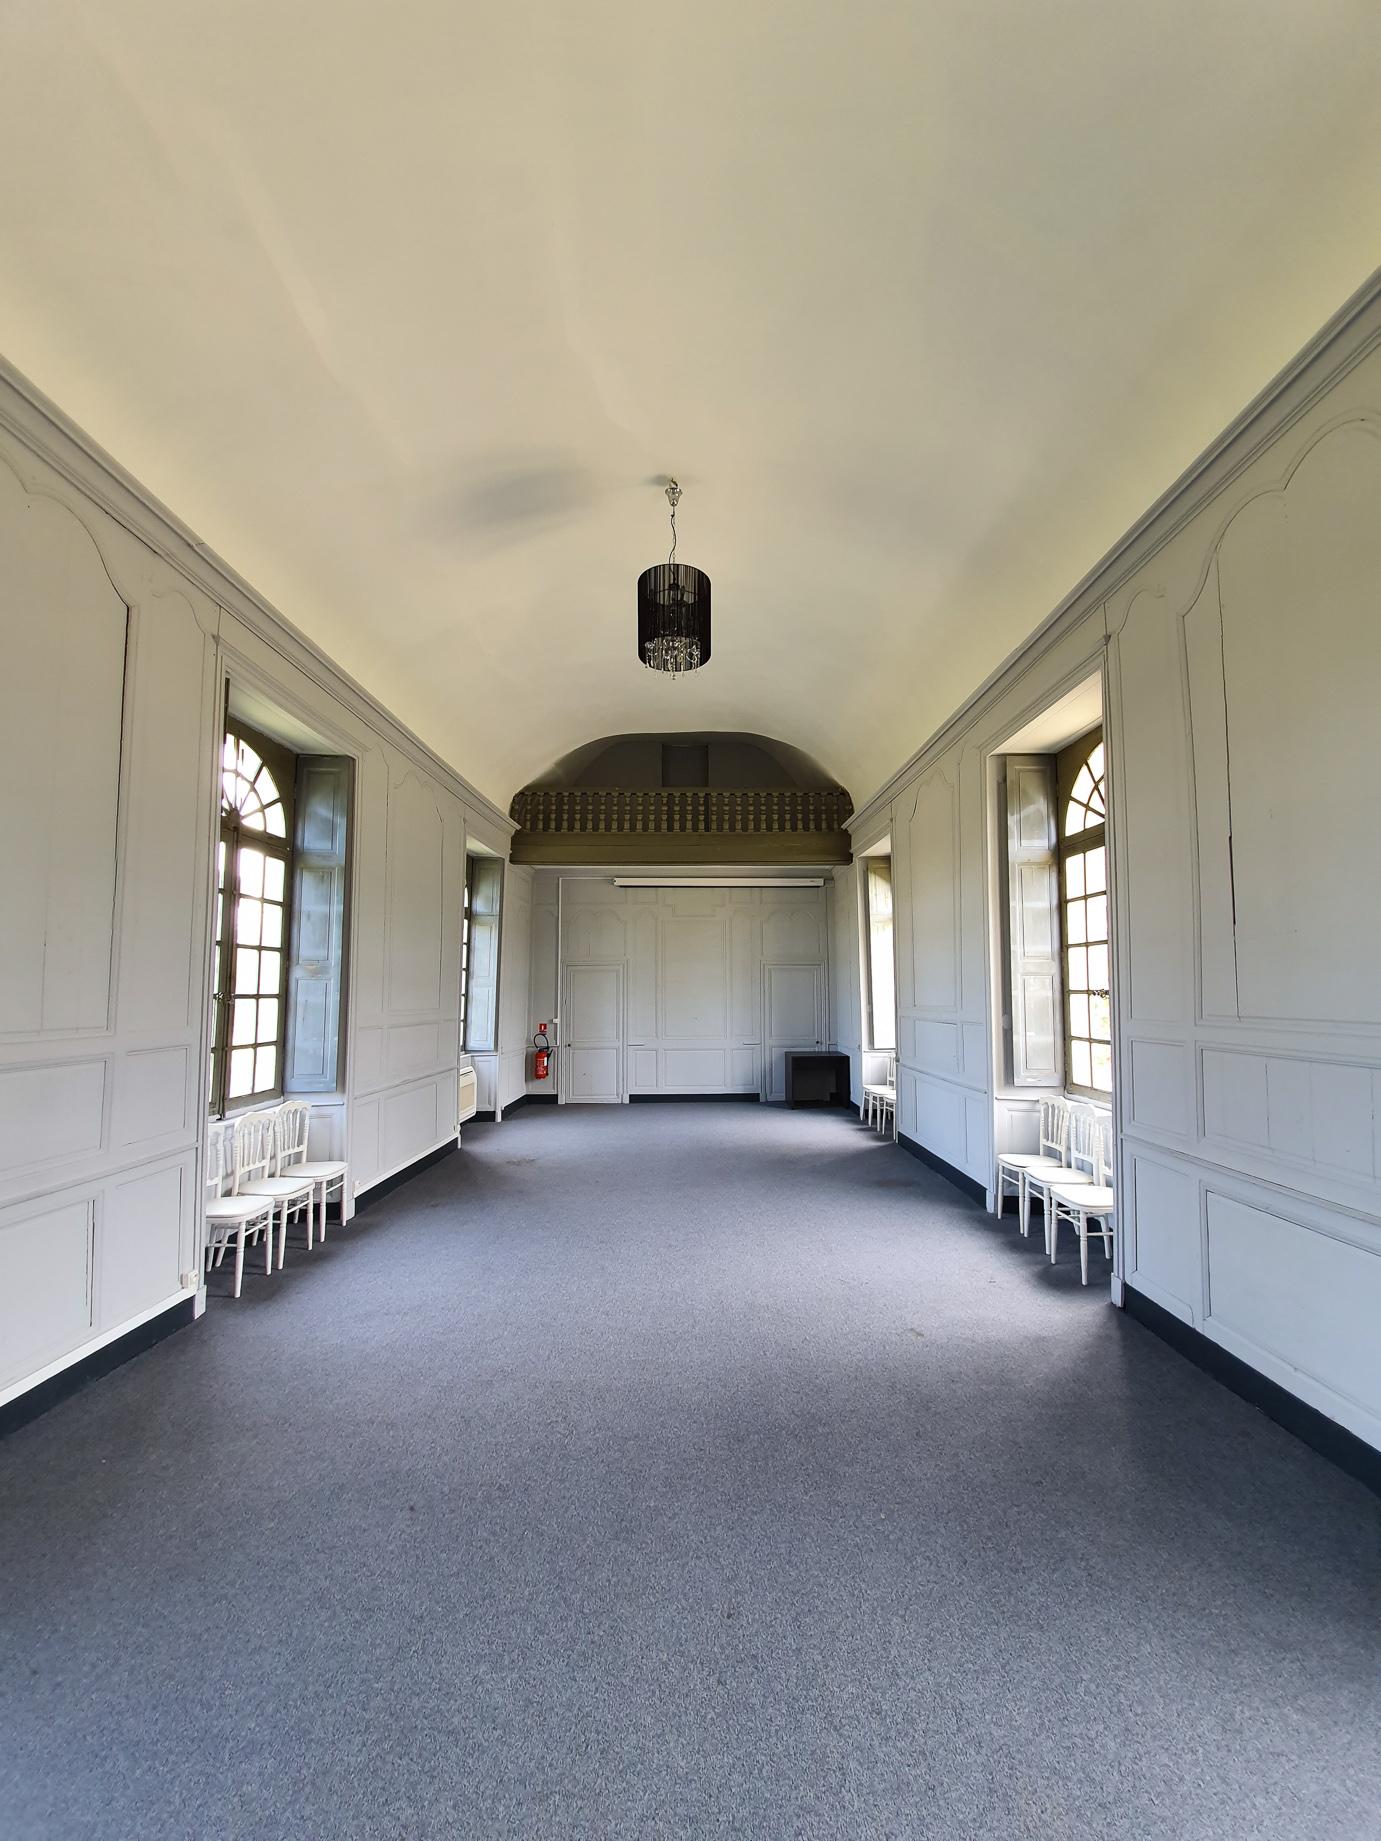 Salle Napoléon at Domaine des Lys Luxury Hotel in the Pays de la Loire in Ancenis